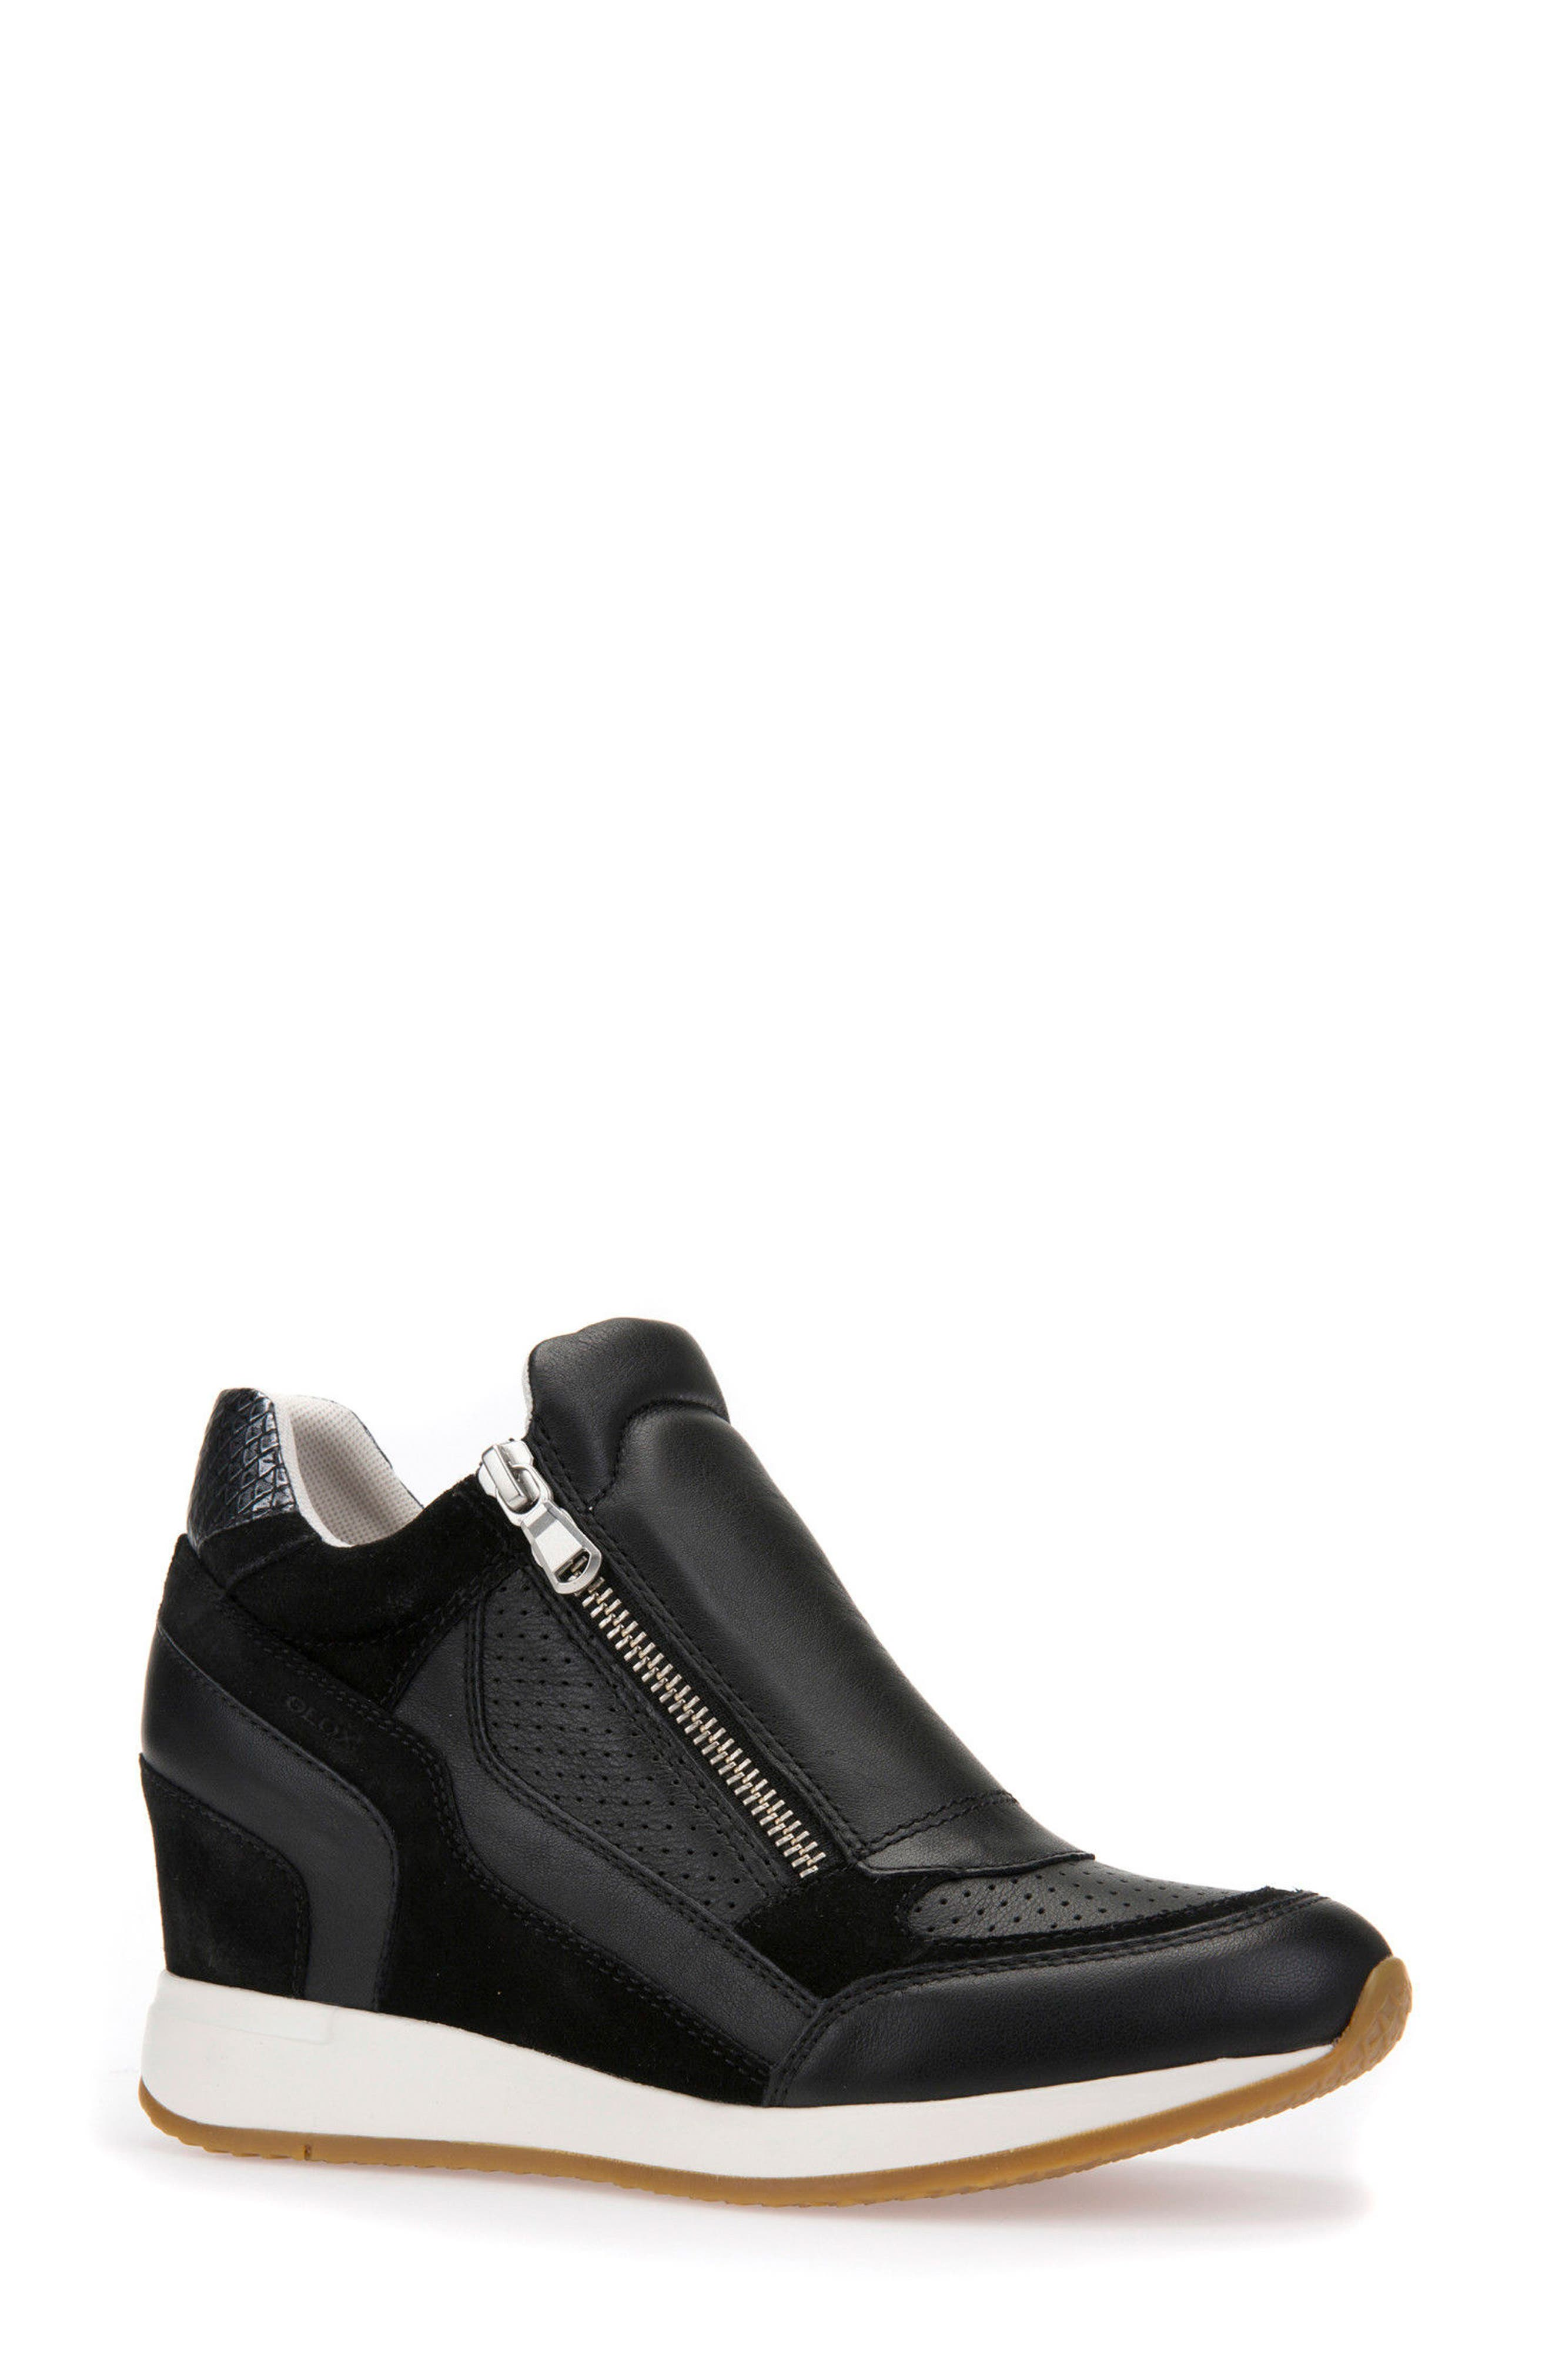 Main Image - Geox Nydame Wedge Sneaker (Women)